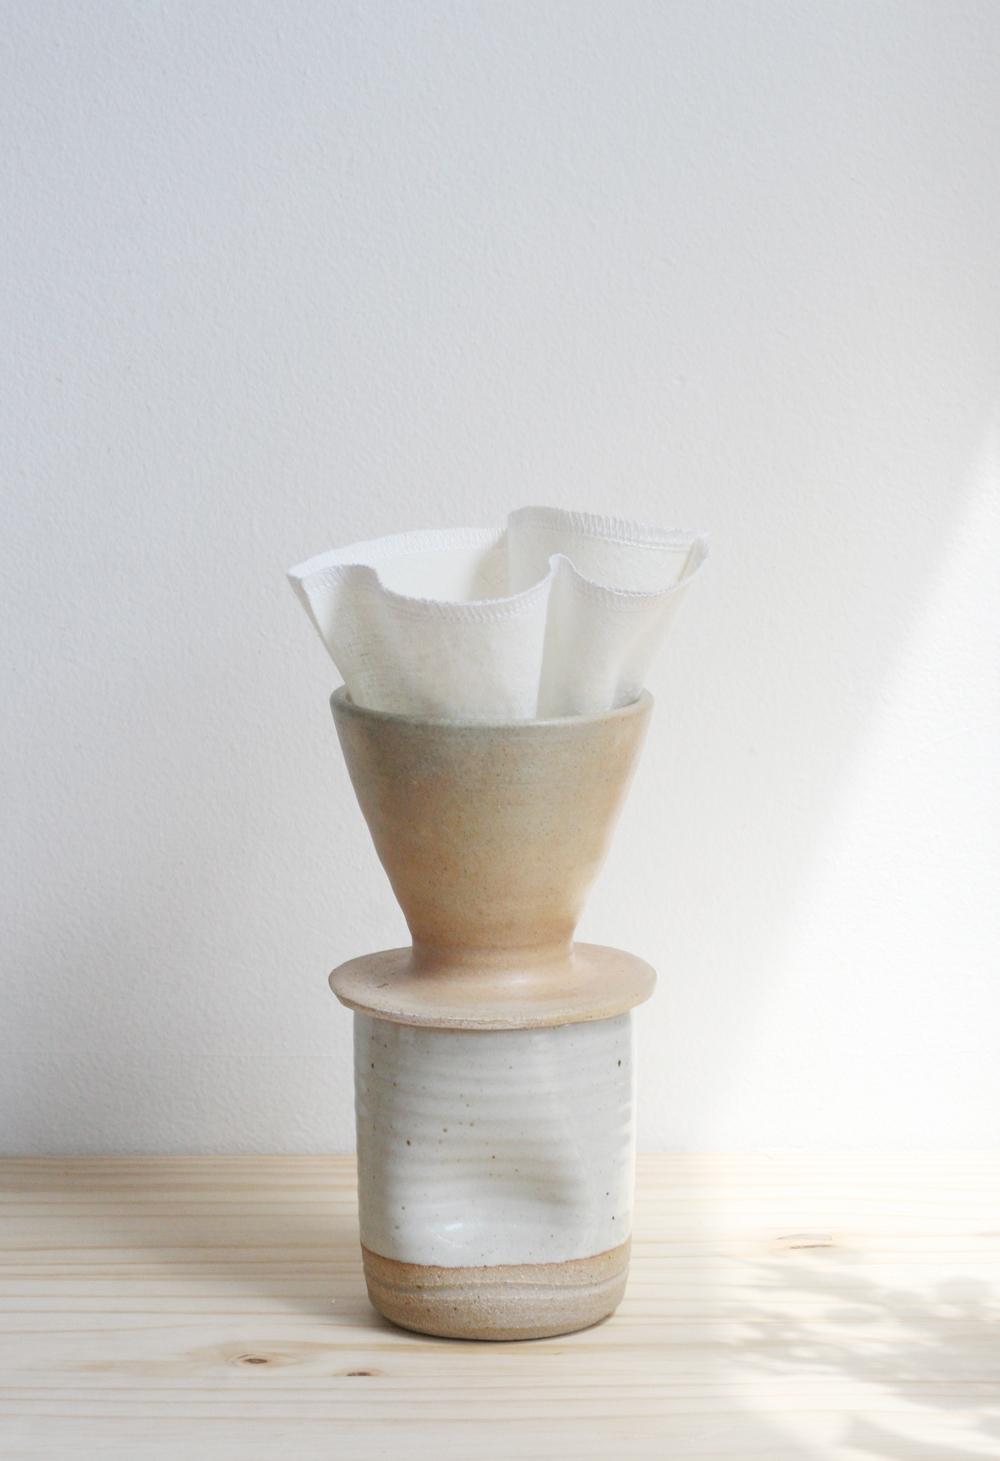 reusable+coffee+filter.jpg